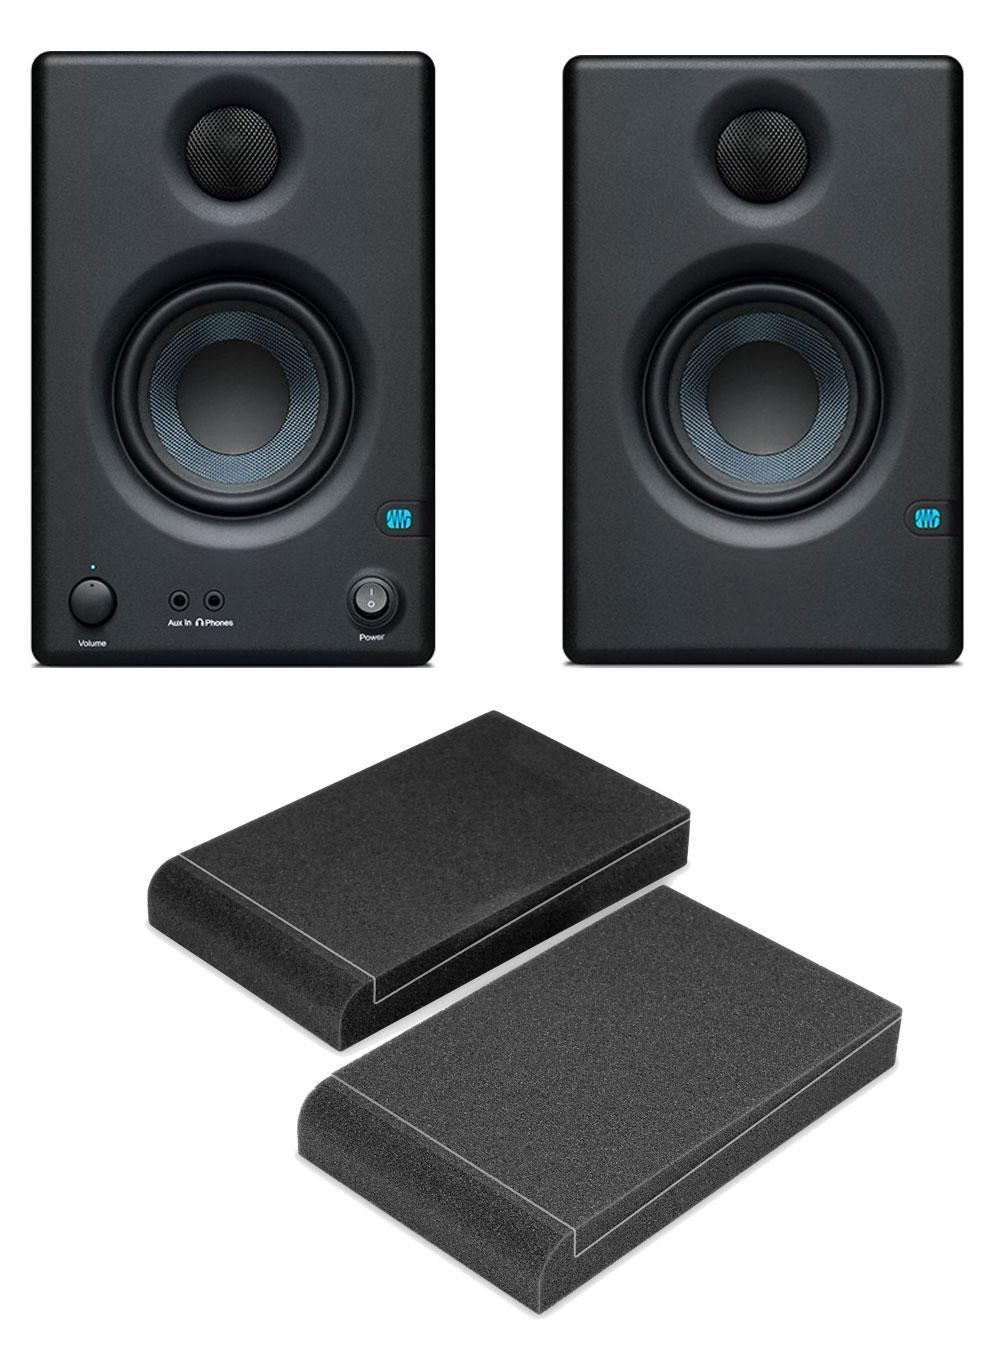 PreSonus Eris E3.5 aktives Studiomonitor-Paar Set Lautsprecher Absorberplatten